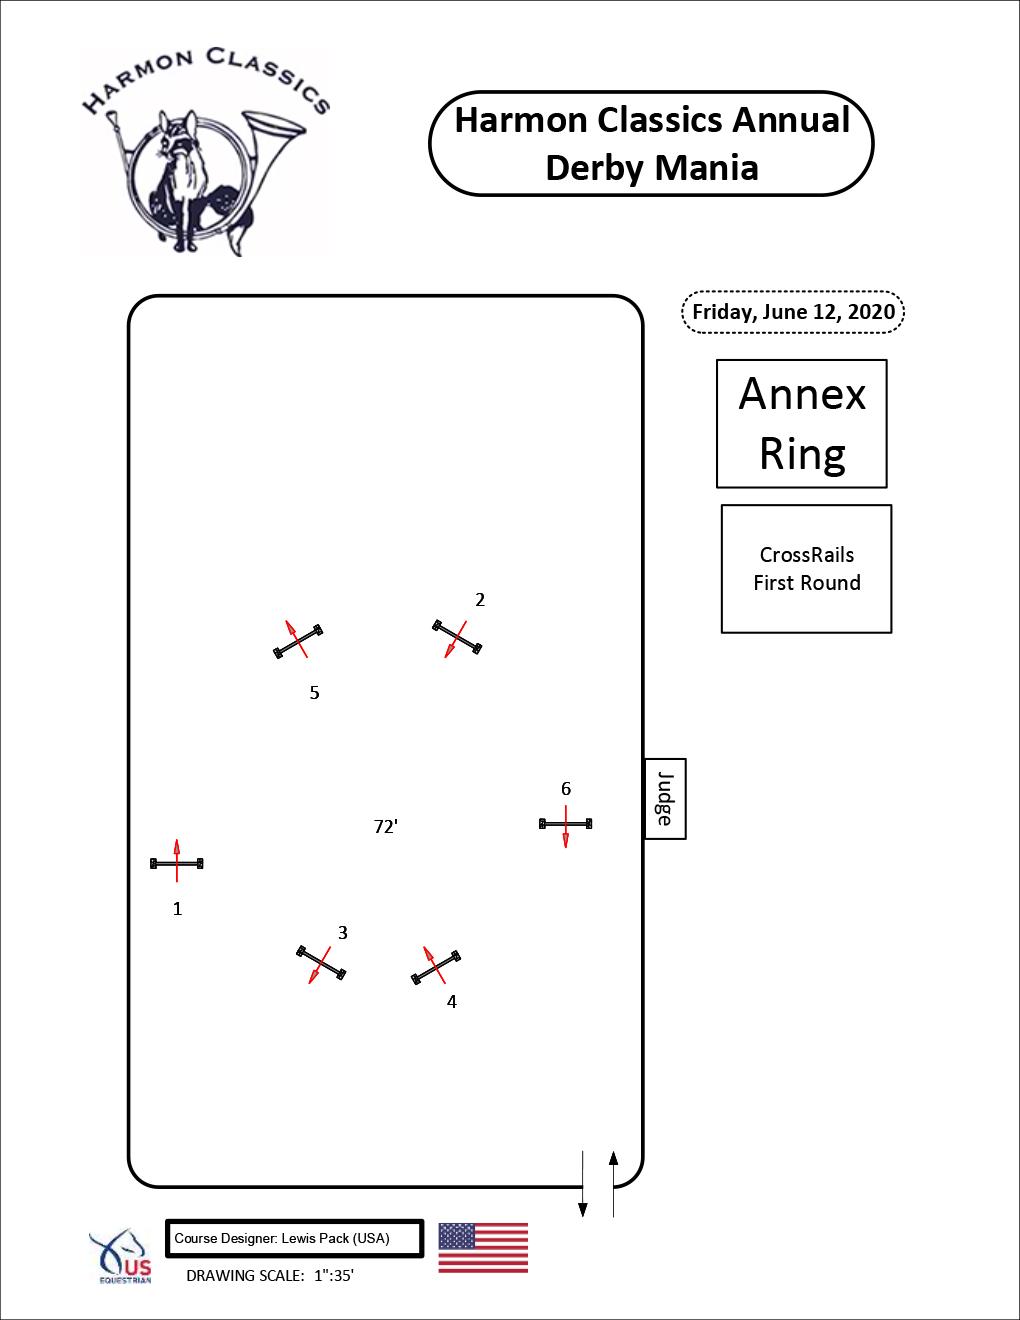 Annex-Ring-Friday6-12-Crossrails-First-Round-Harmon-Classics-Derby-Mania